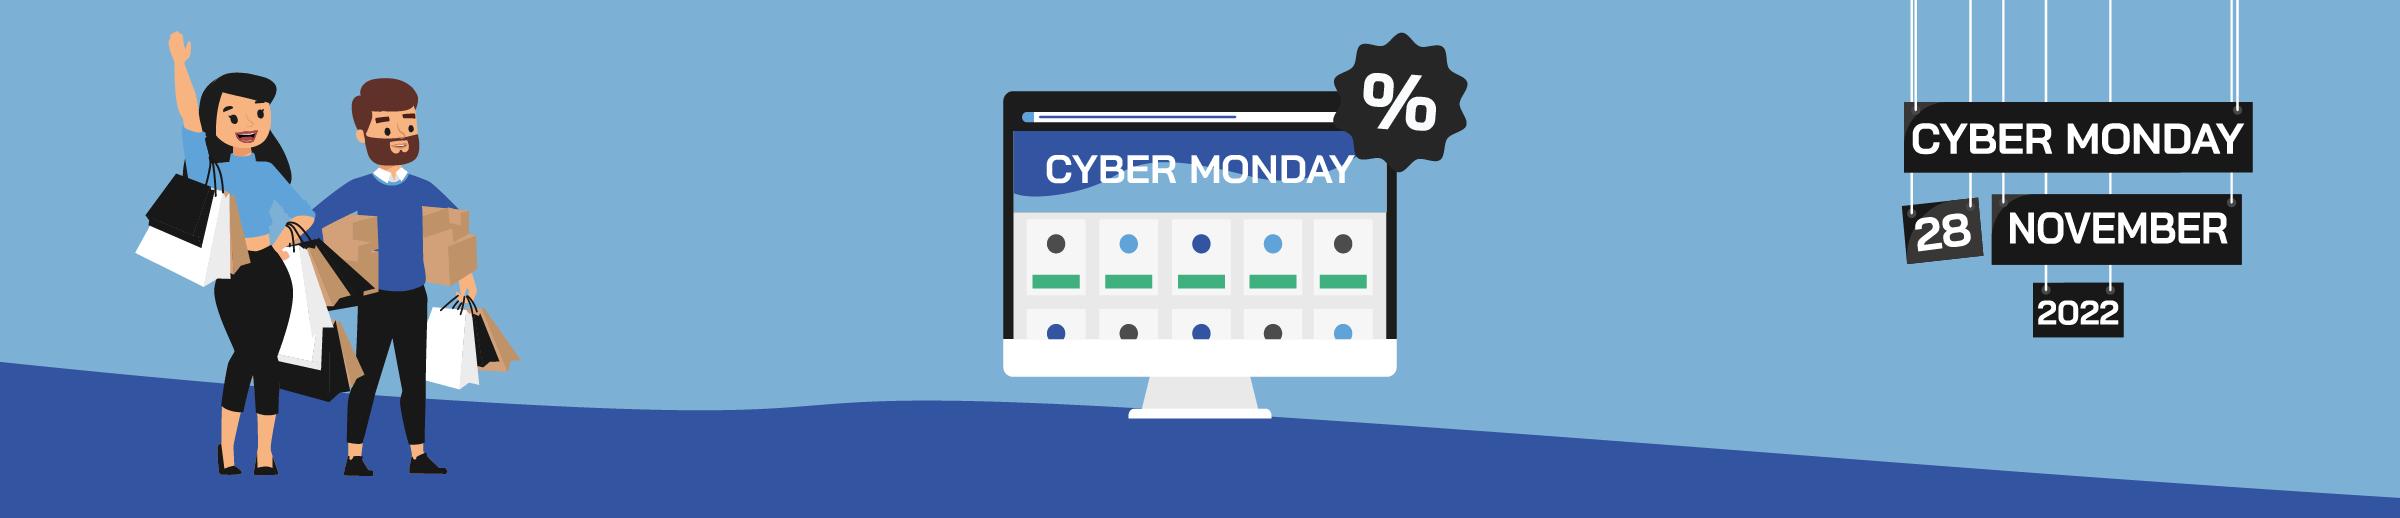 Cyber Monday 2022